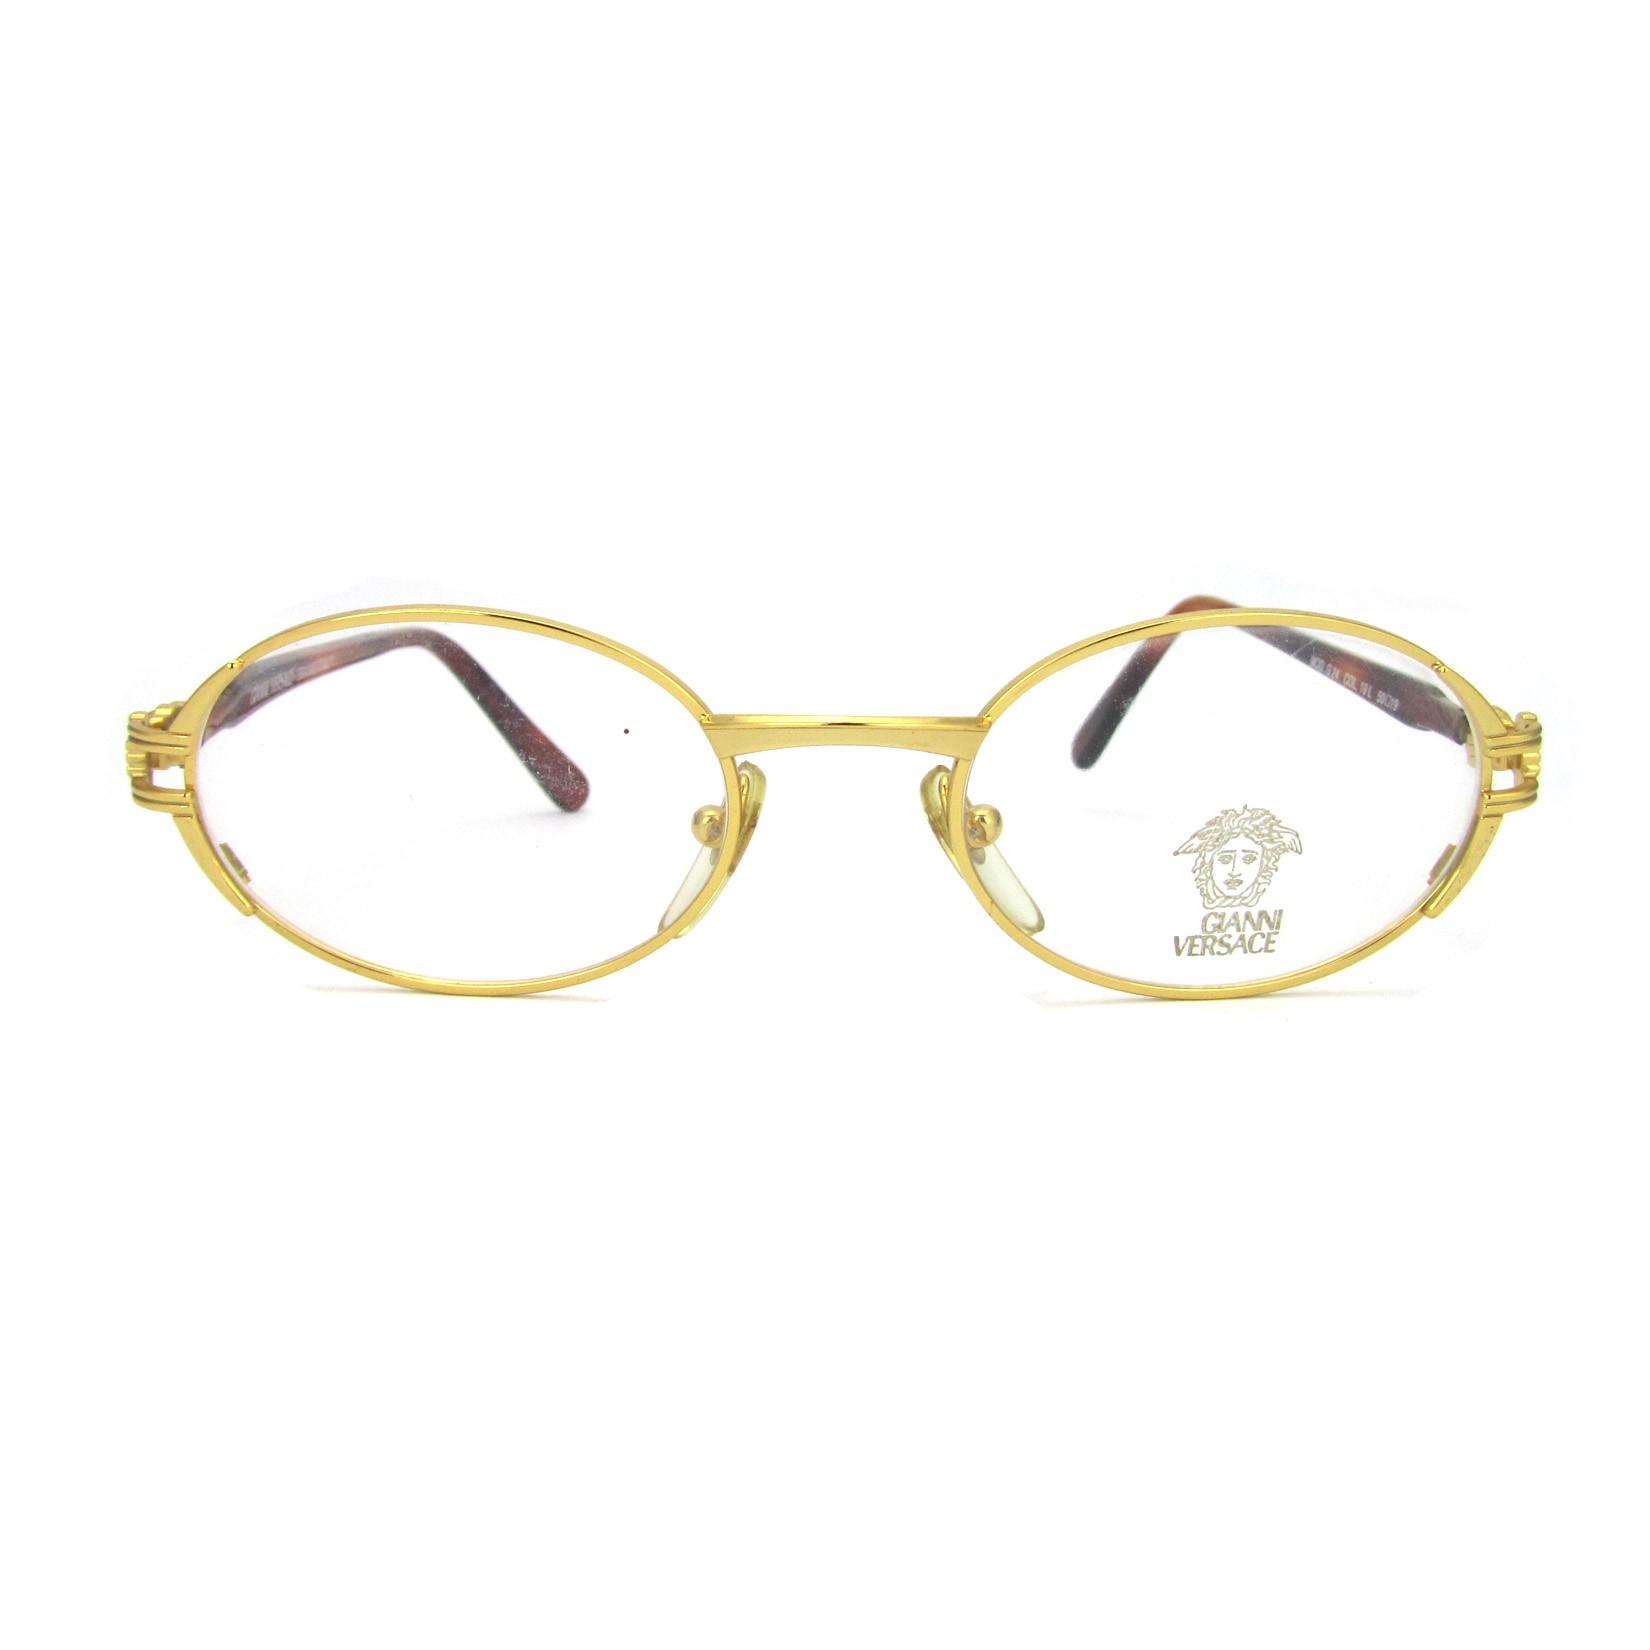 Versace   Sunglasses and Prescription Eyeglasses   Vintage Eyeglass ...